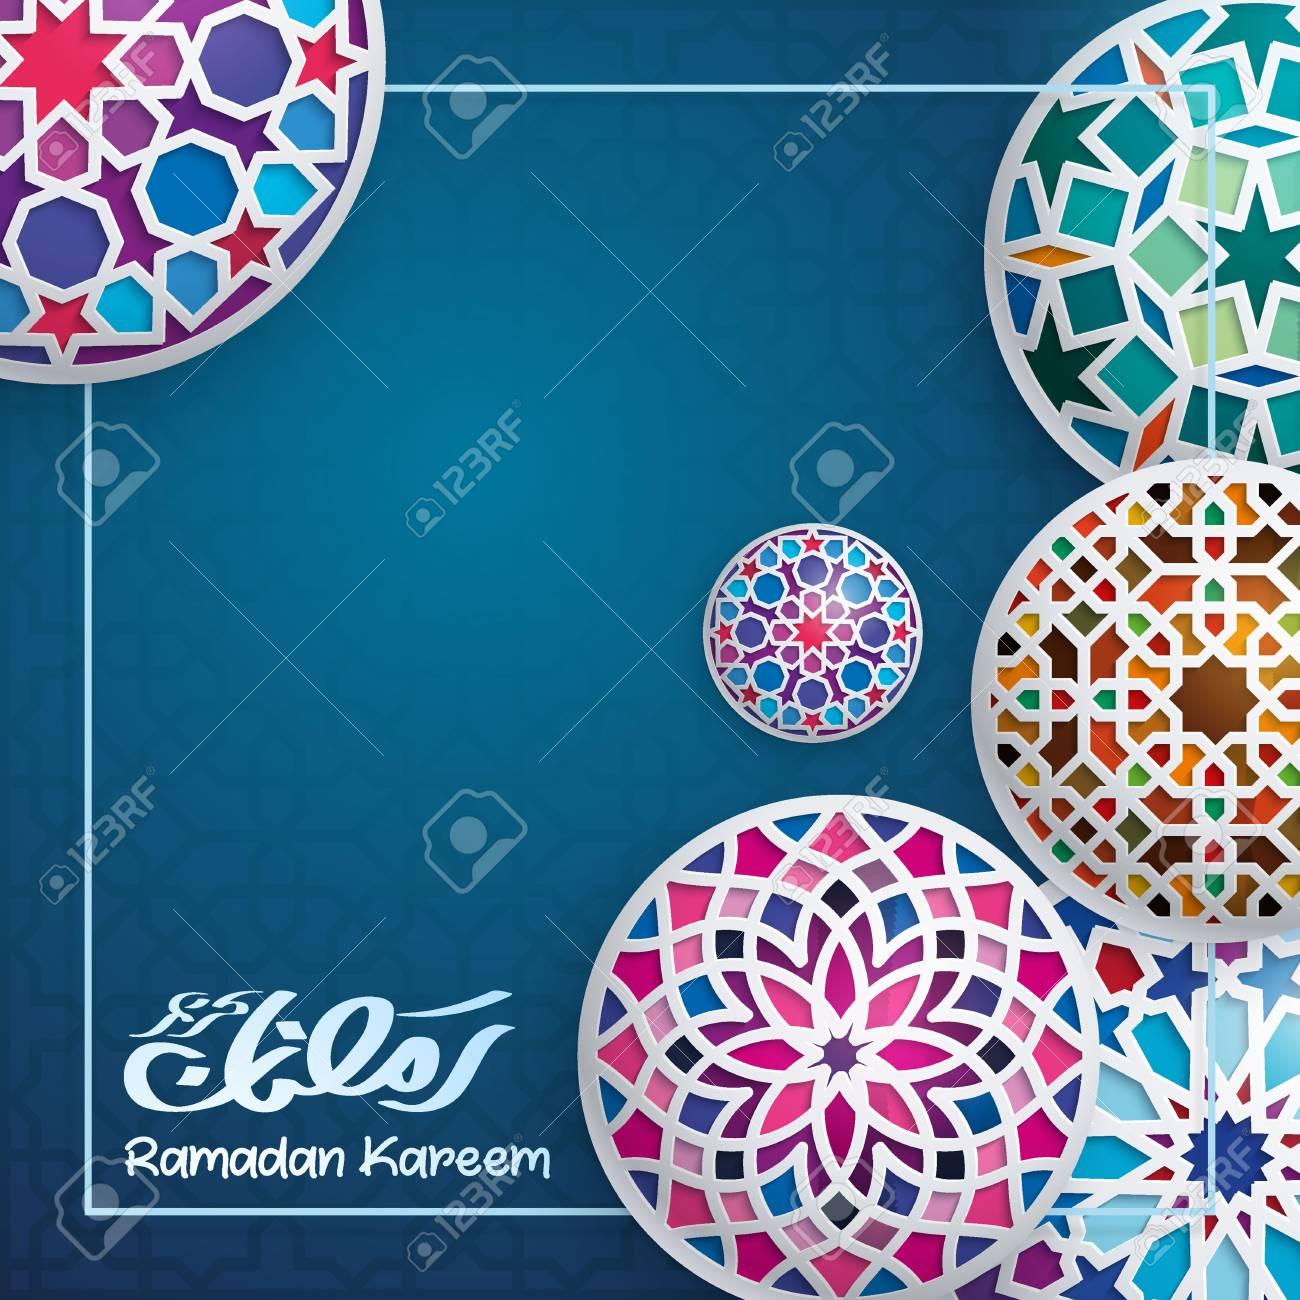 Ramadan islamic greeting banner template with colorful morocco circle pattern geometric ornament - 100943312